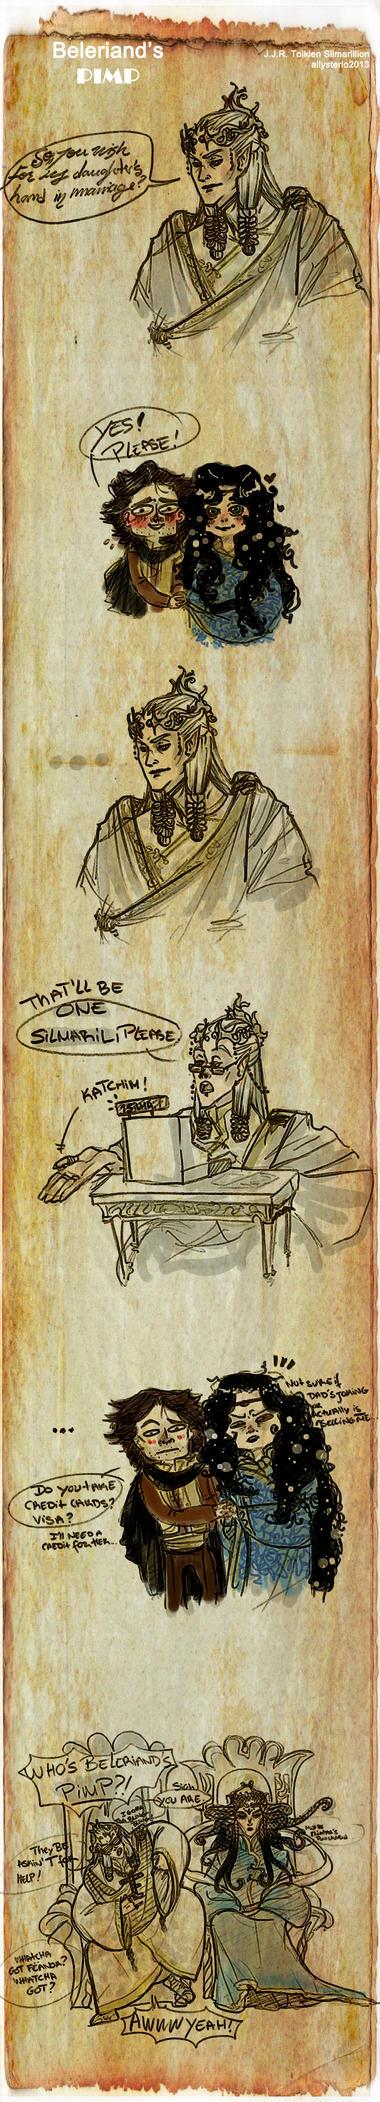 Silmarillion - Beleriand's Pimp by Allysterio